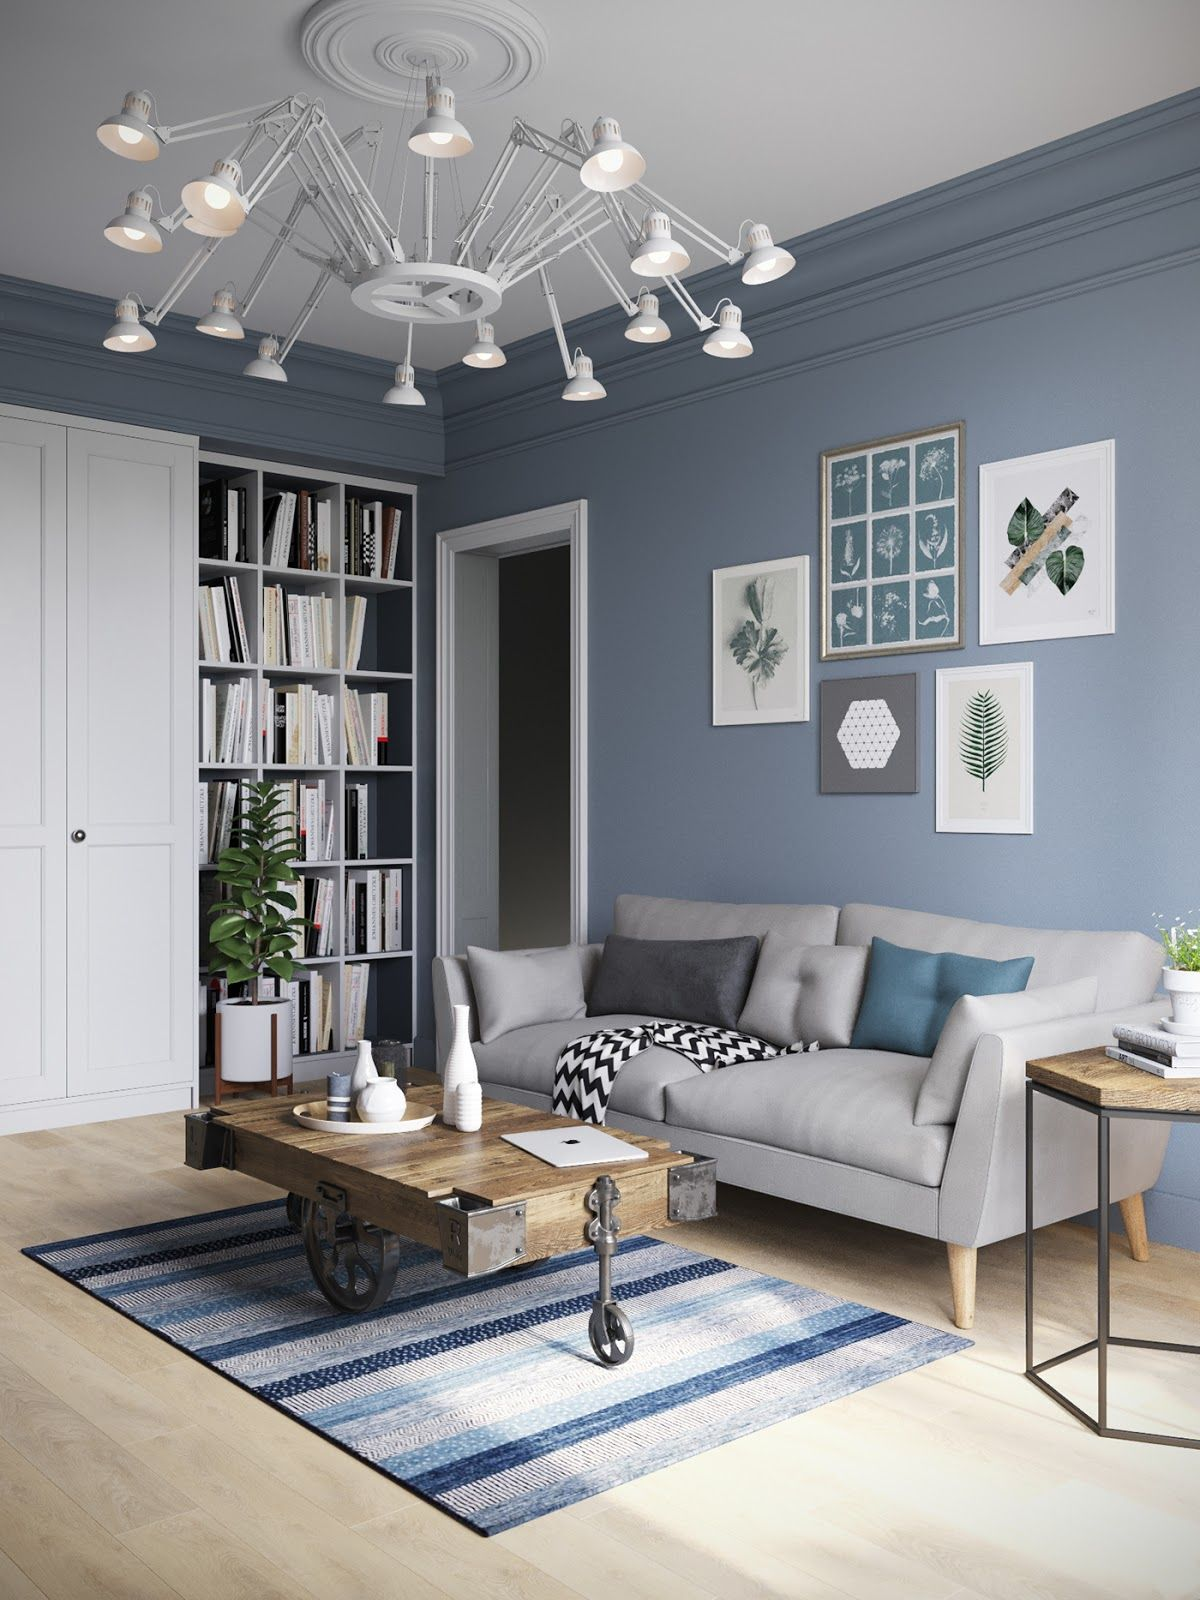 Albastru alb  gri intr un proiect de amenajare modern pentru apartament  din sankt petersburg jurnal design interior also beach style living room color paint ideas rh pinterest